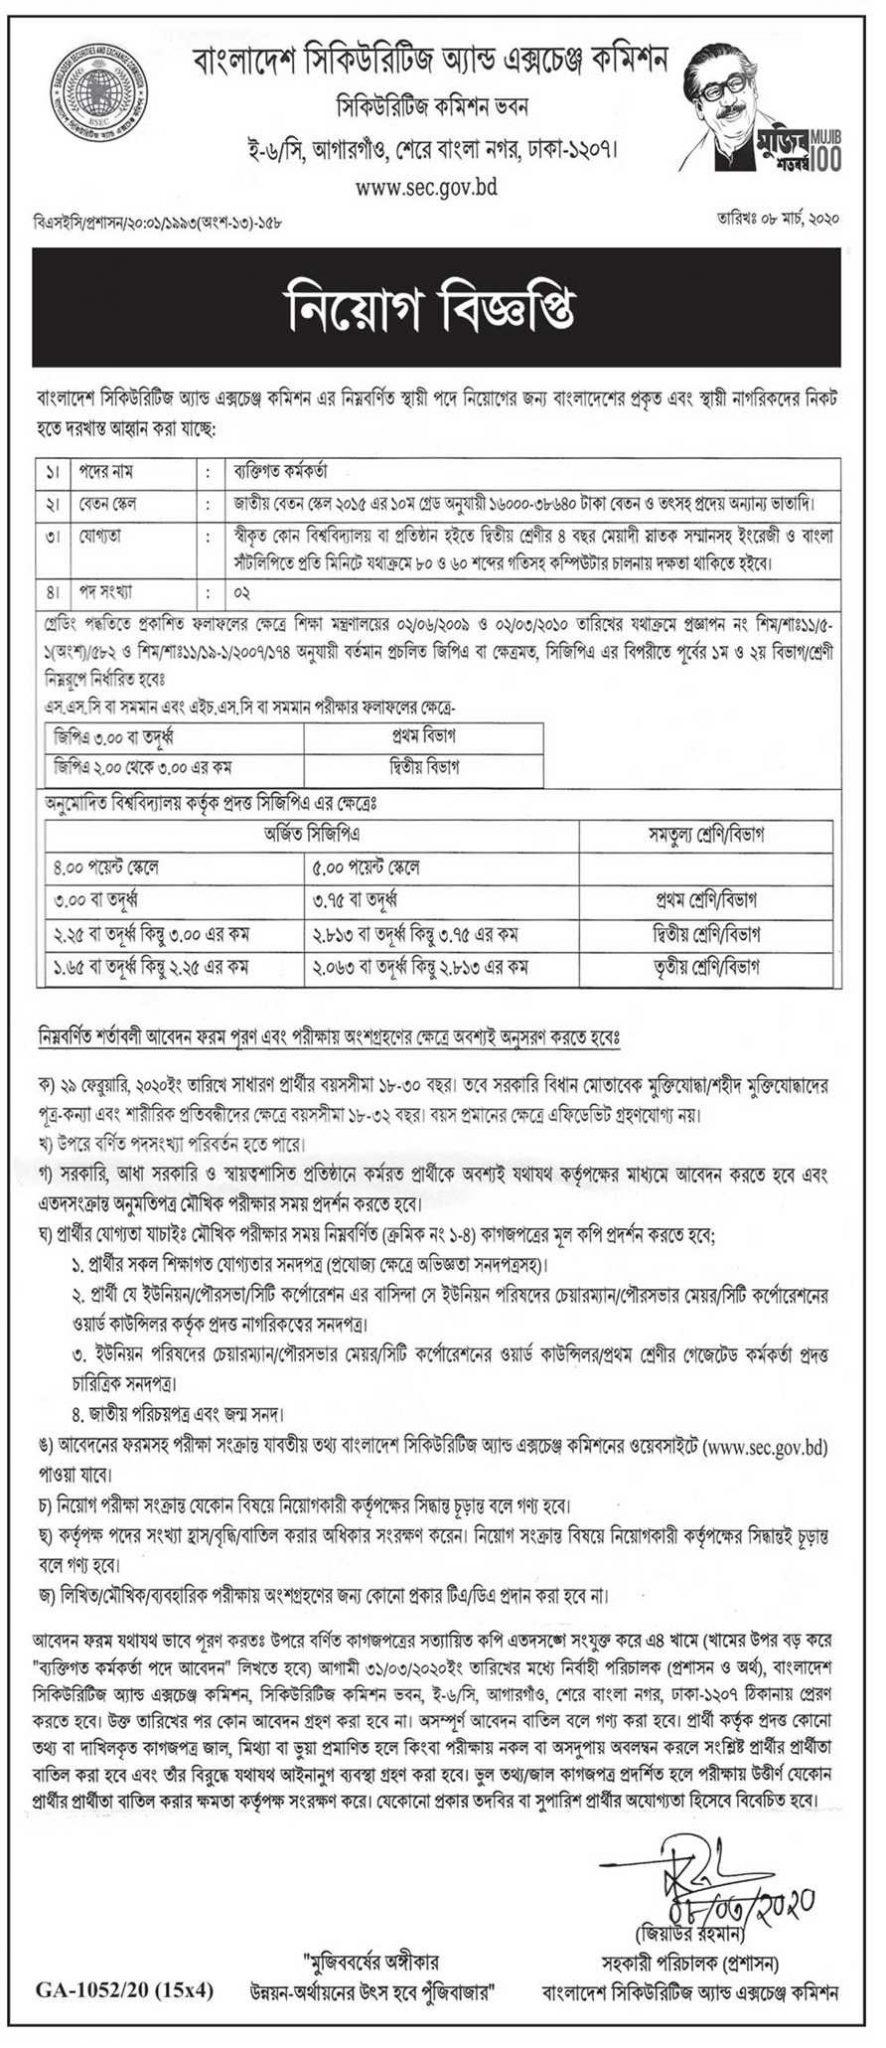 Bangladesh Securities and Exchange Commission Job Circular 2020